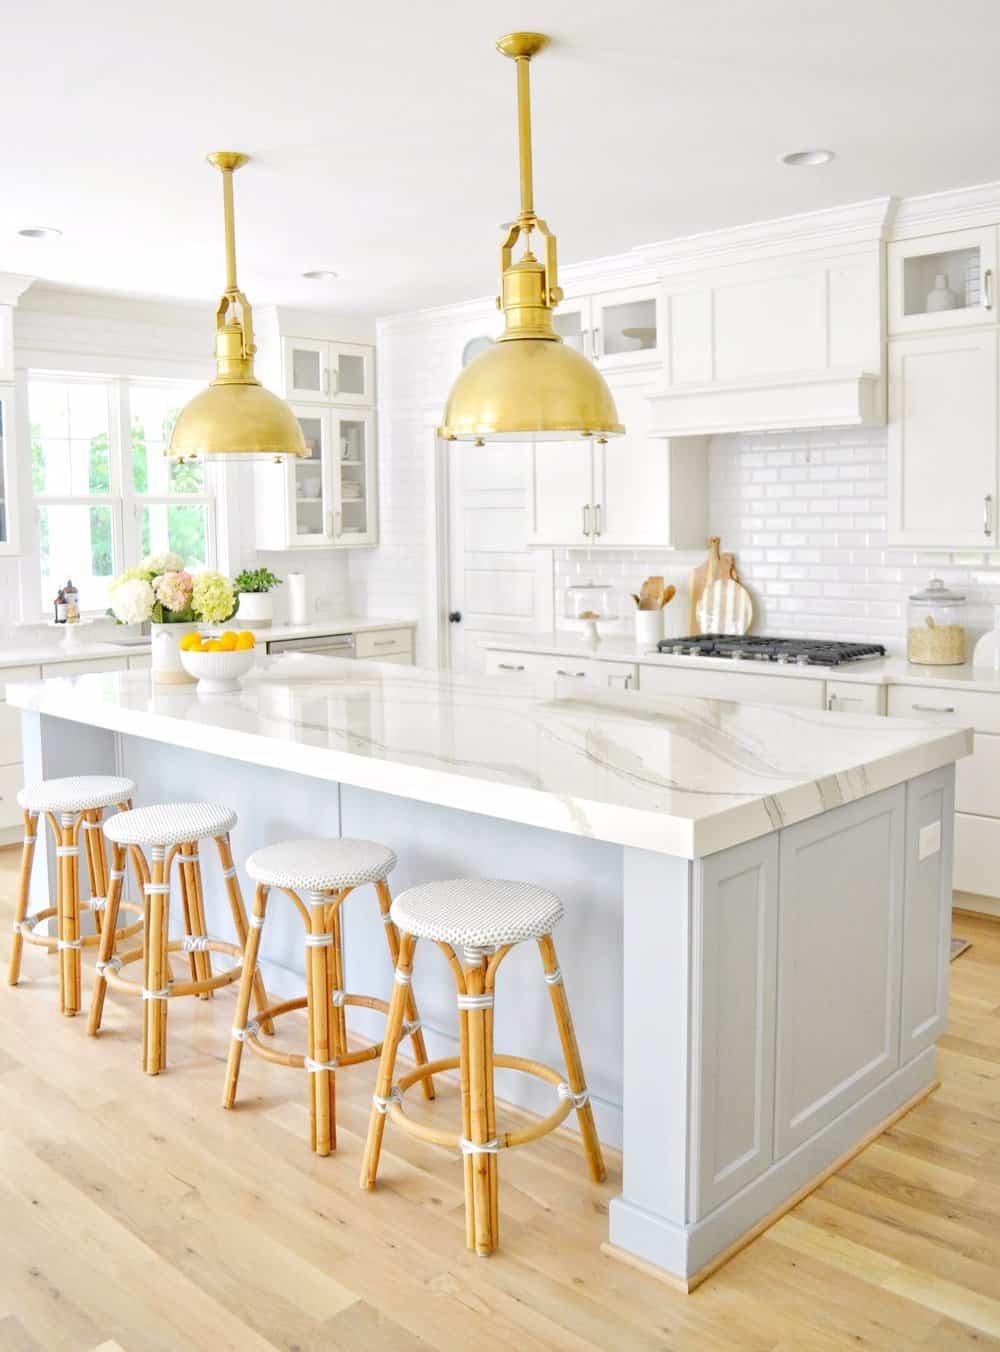 دکوراسیون آشپزخانه آبی روشن